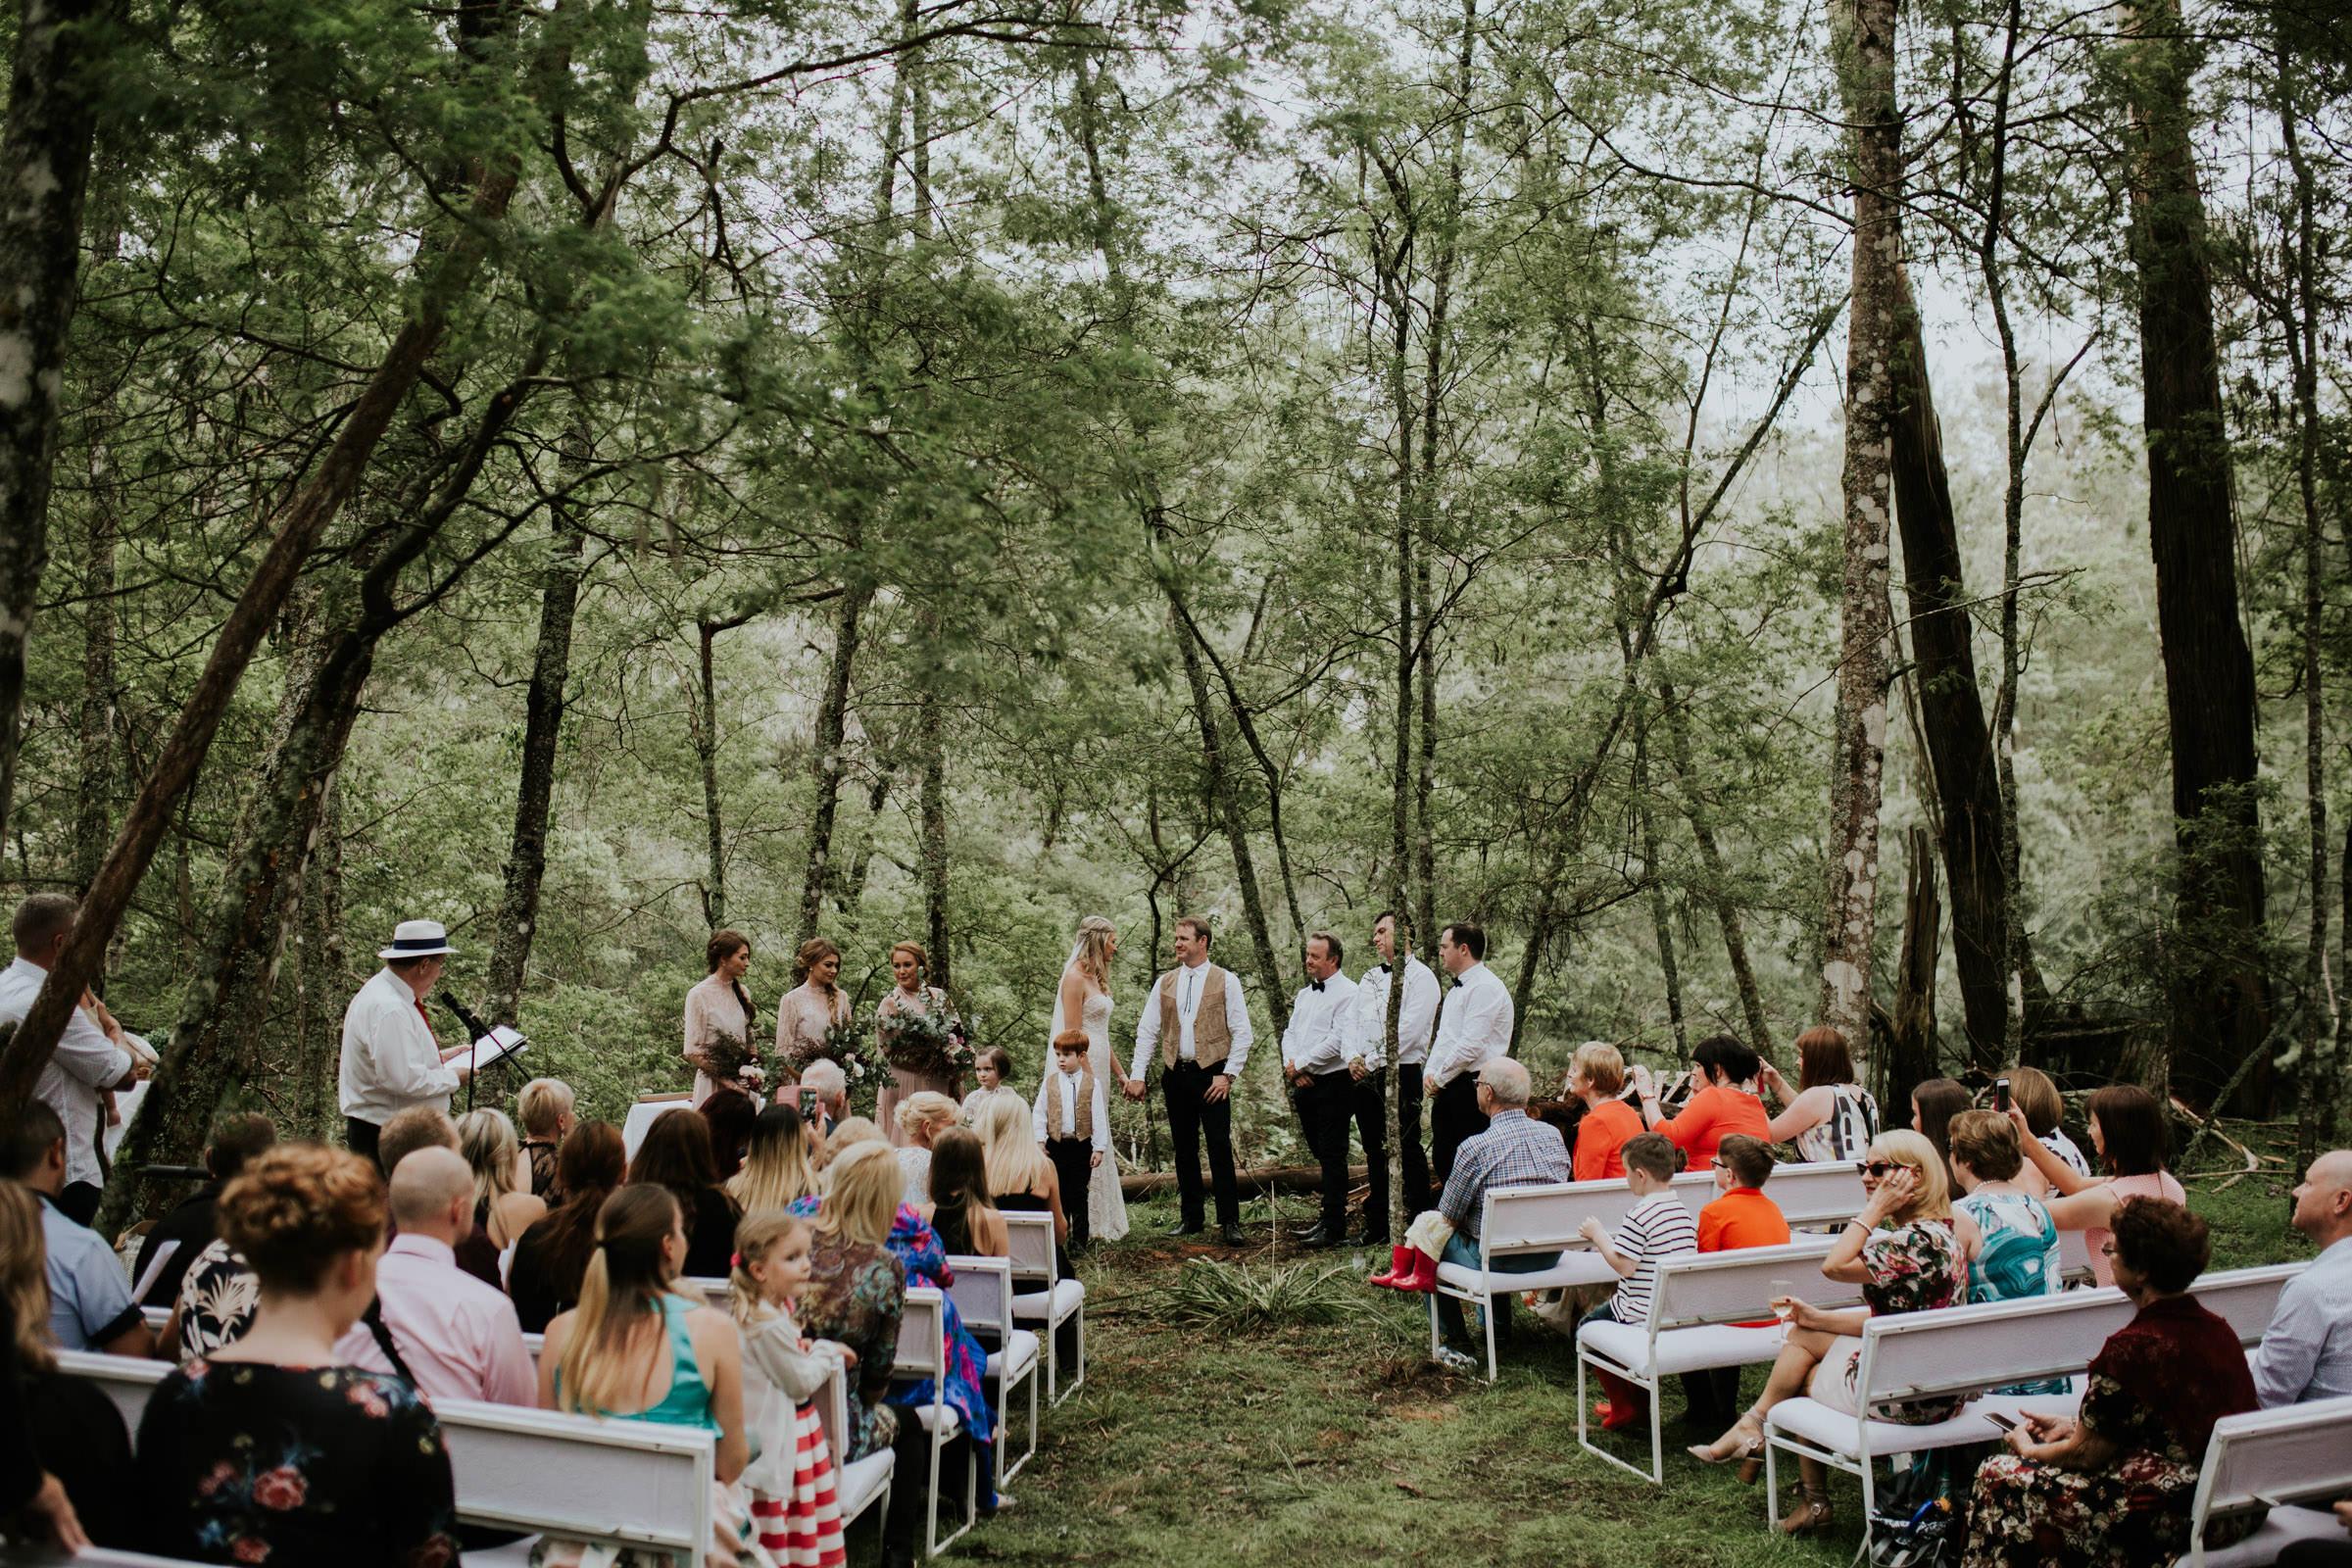 Emma+John+Far+South+Coast+Wedding+Festivl+Glamping+Bush-102.jpg